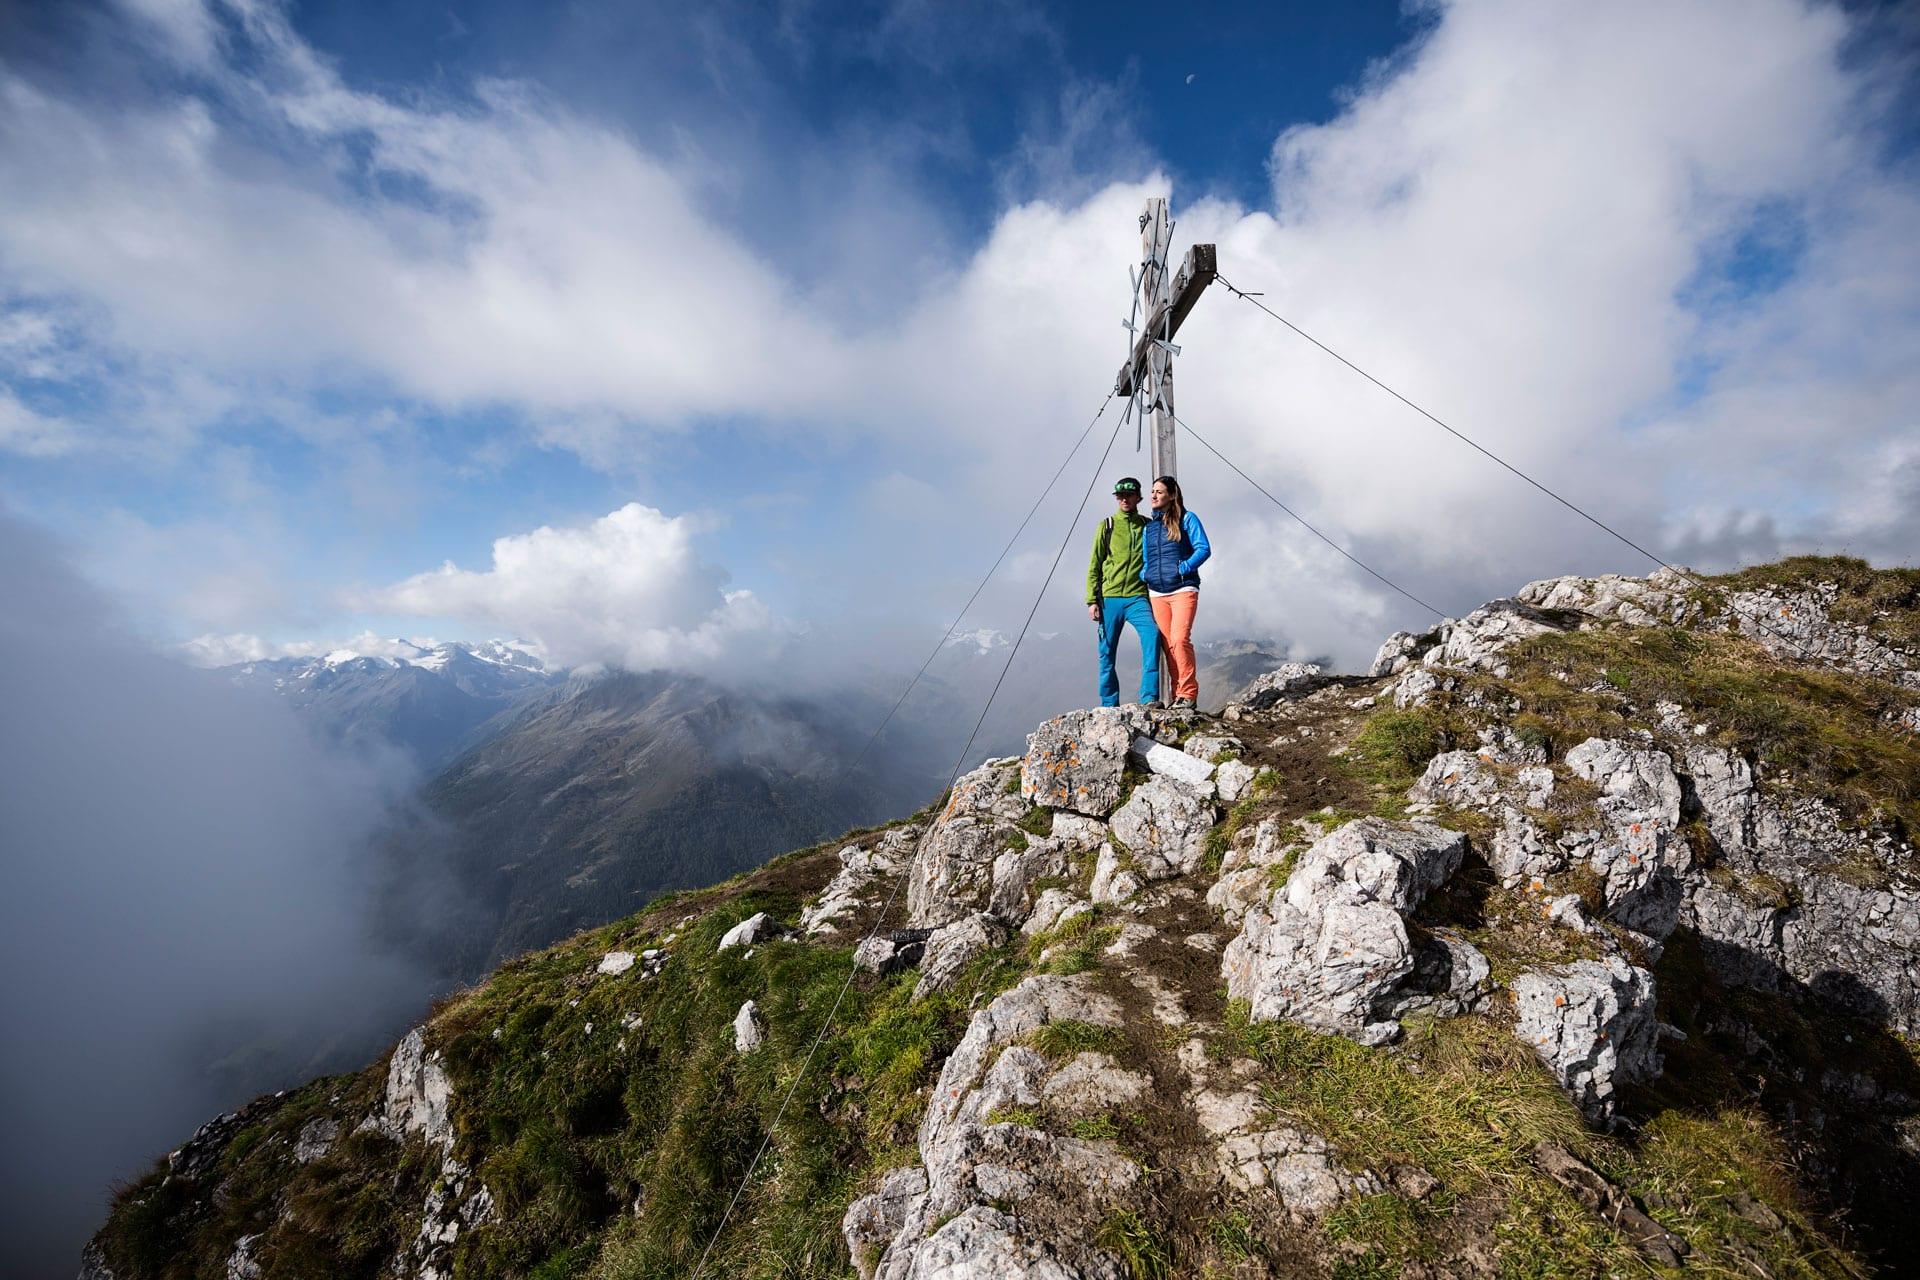 Gipfel besteigen im Stubaital